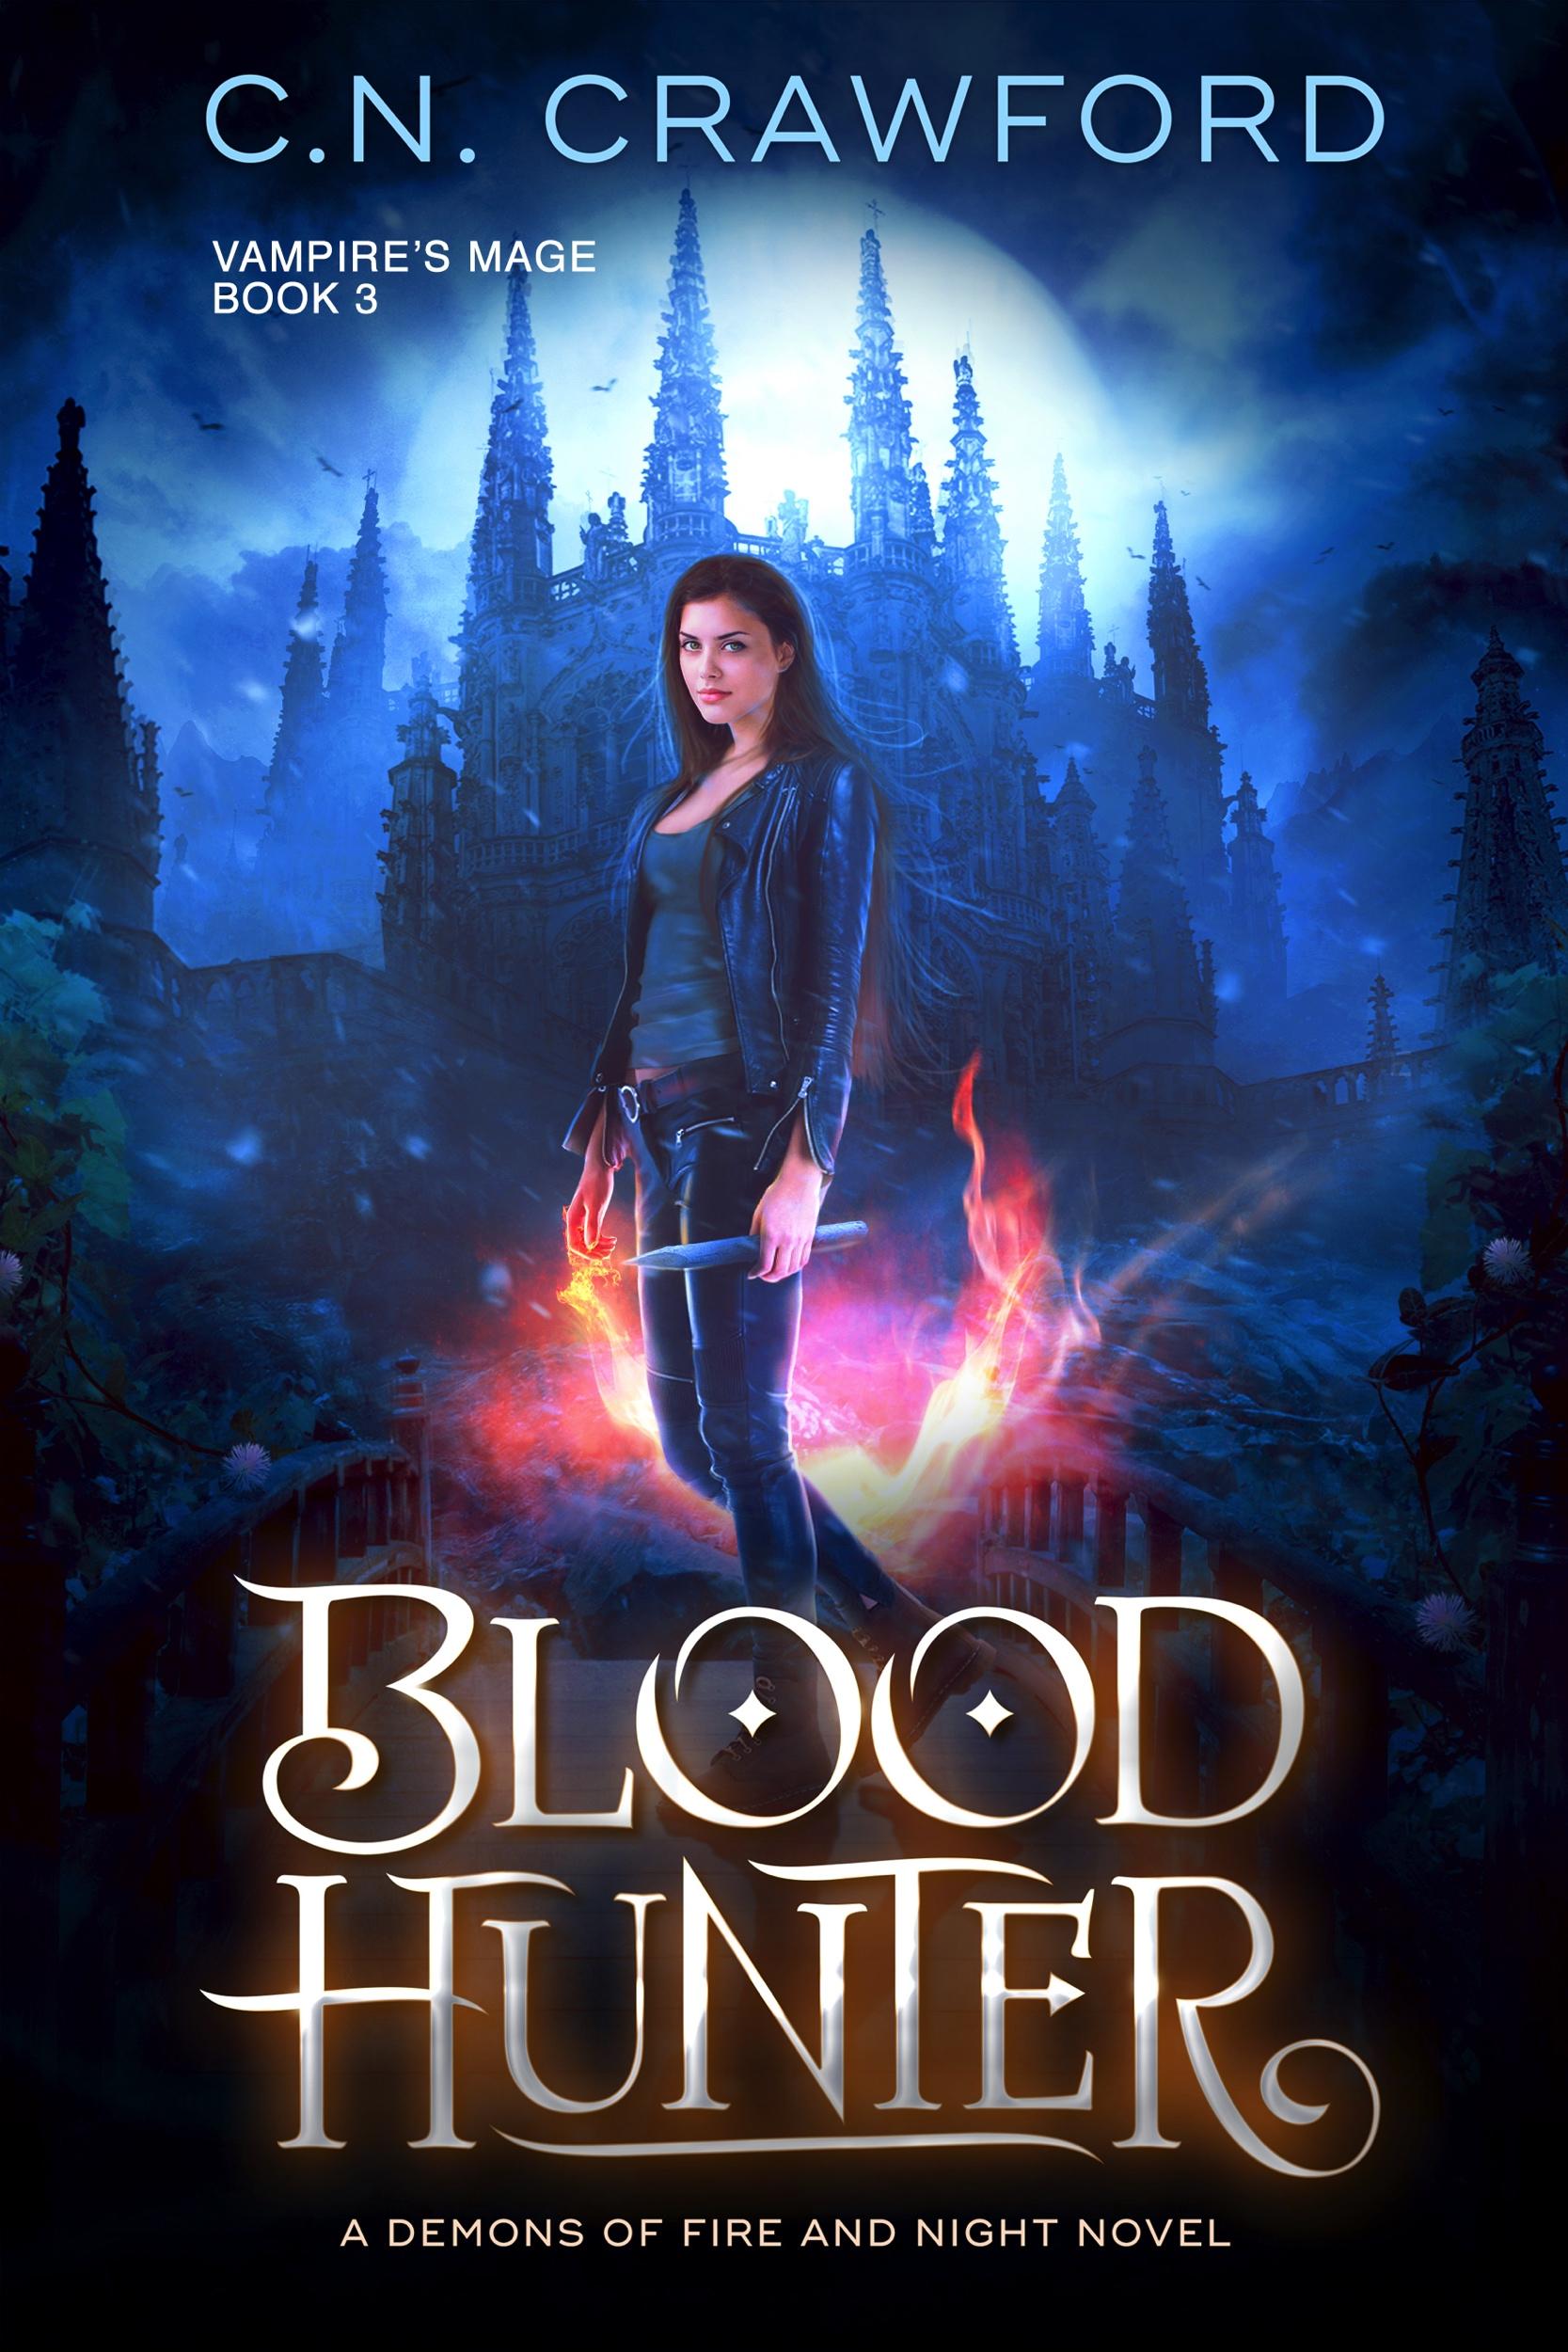 Book 3: Blood Hunter